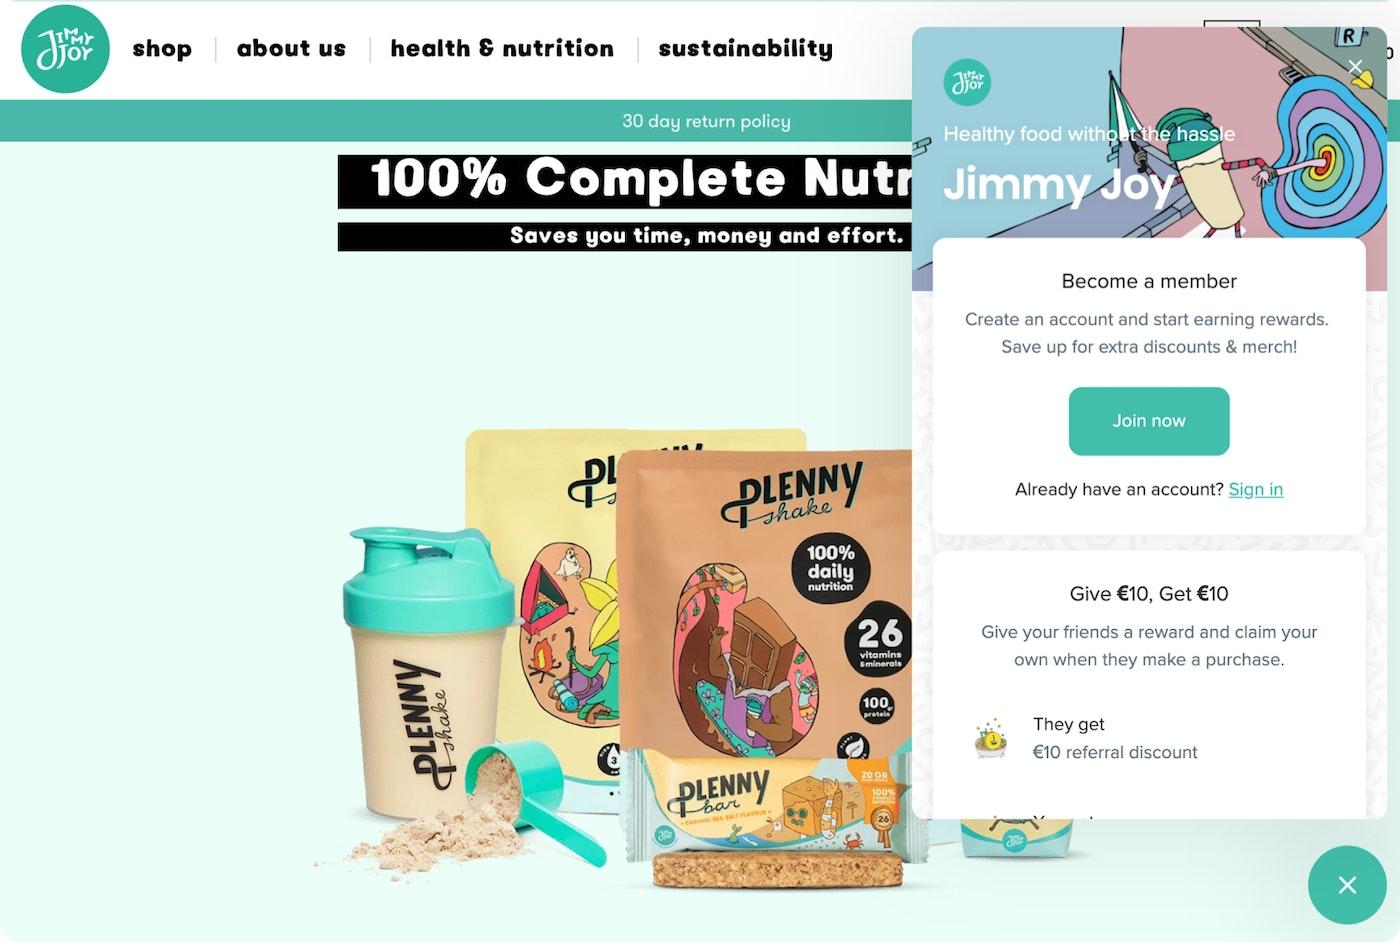 Screenshot of Jimmy Joy's website and loyalty program